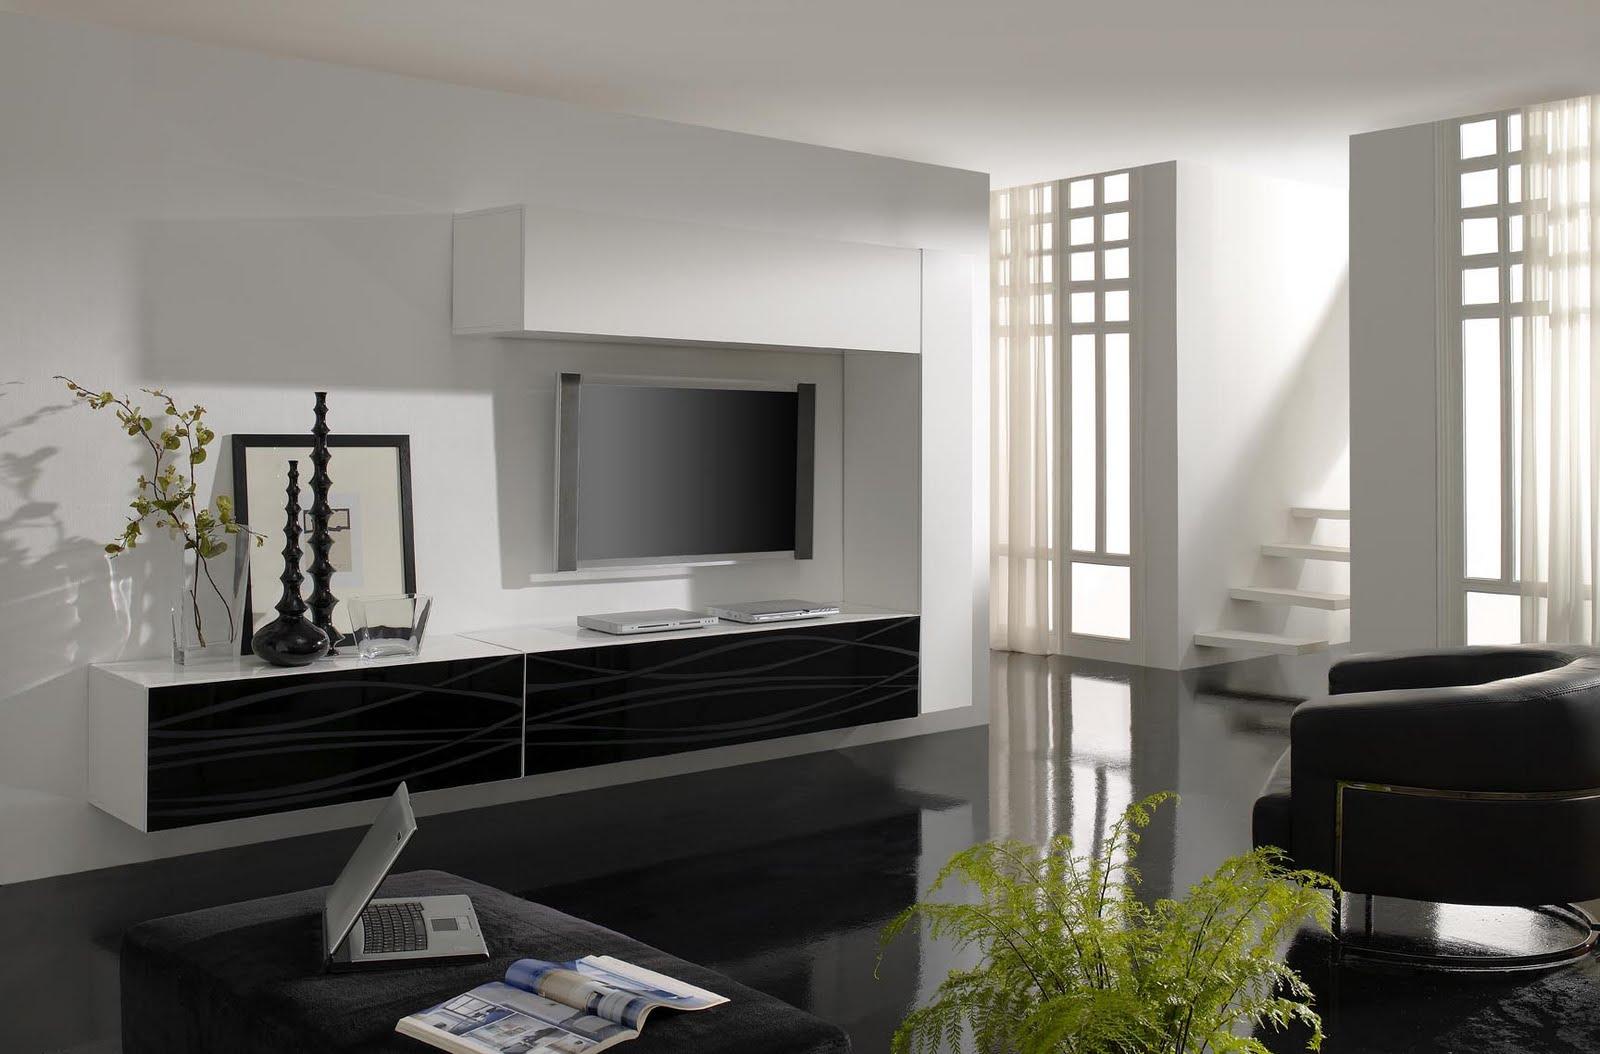 Muebles Modernos Ideas Designs Of Home And Garden